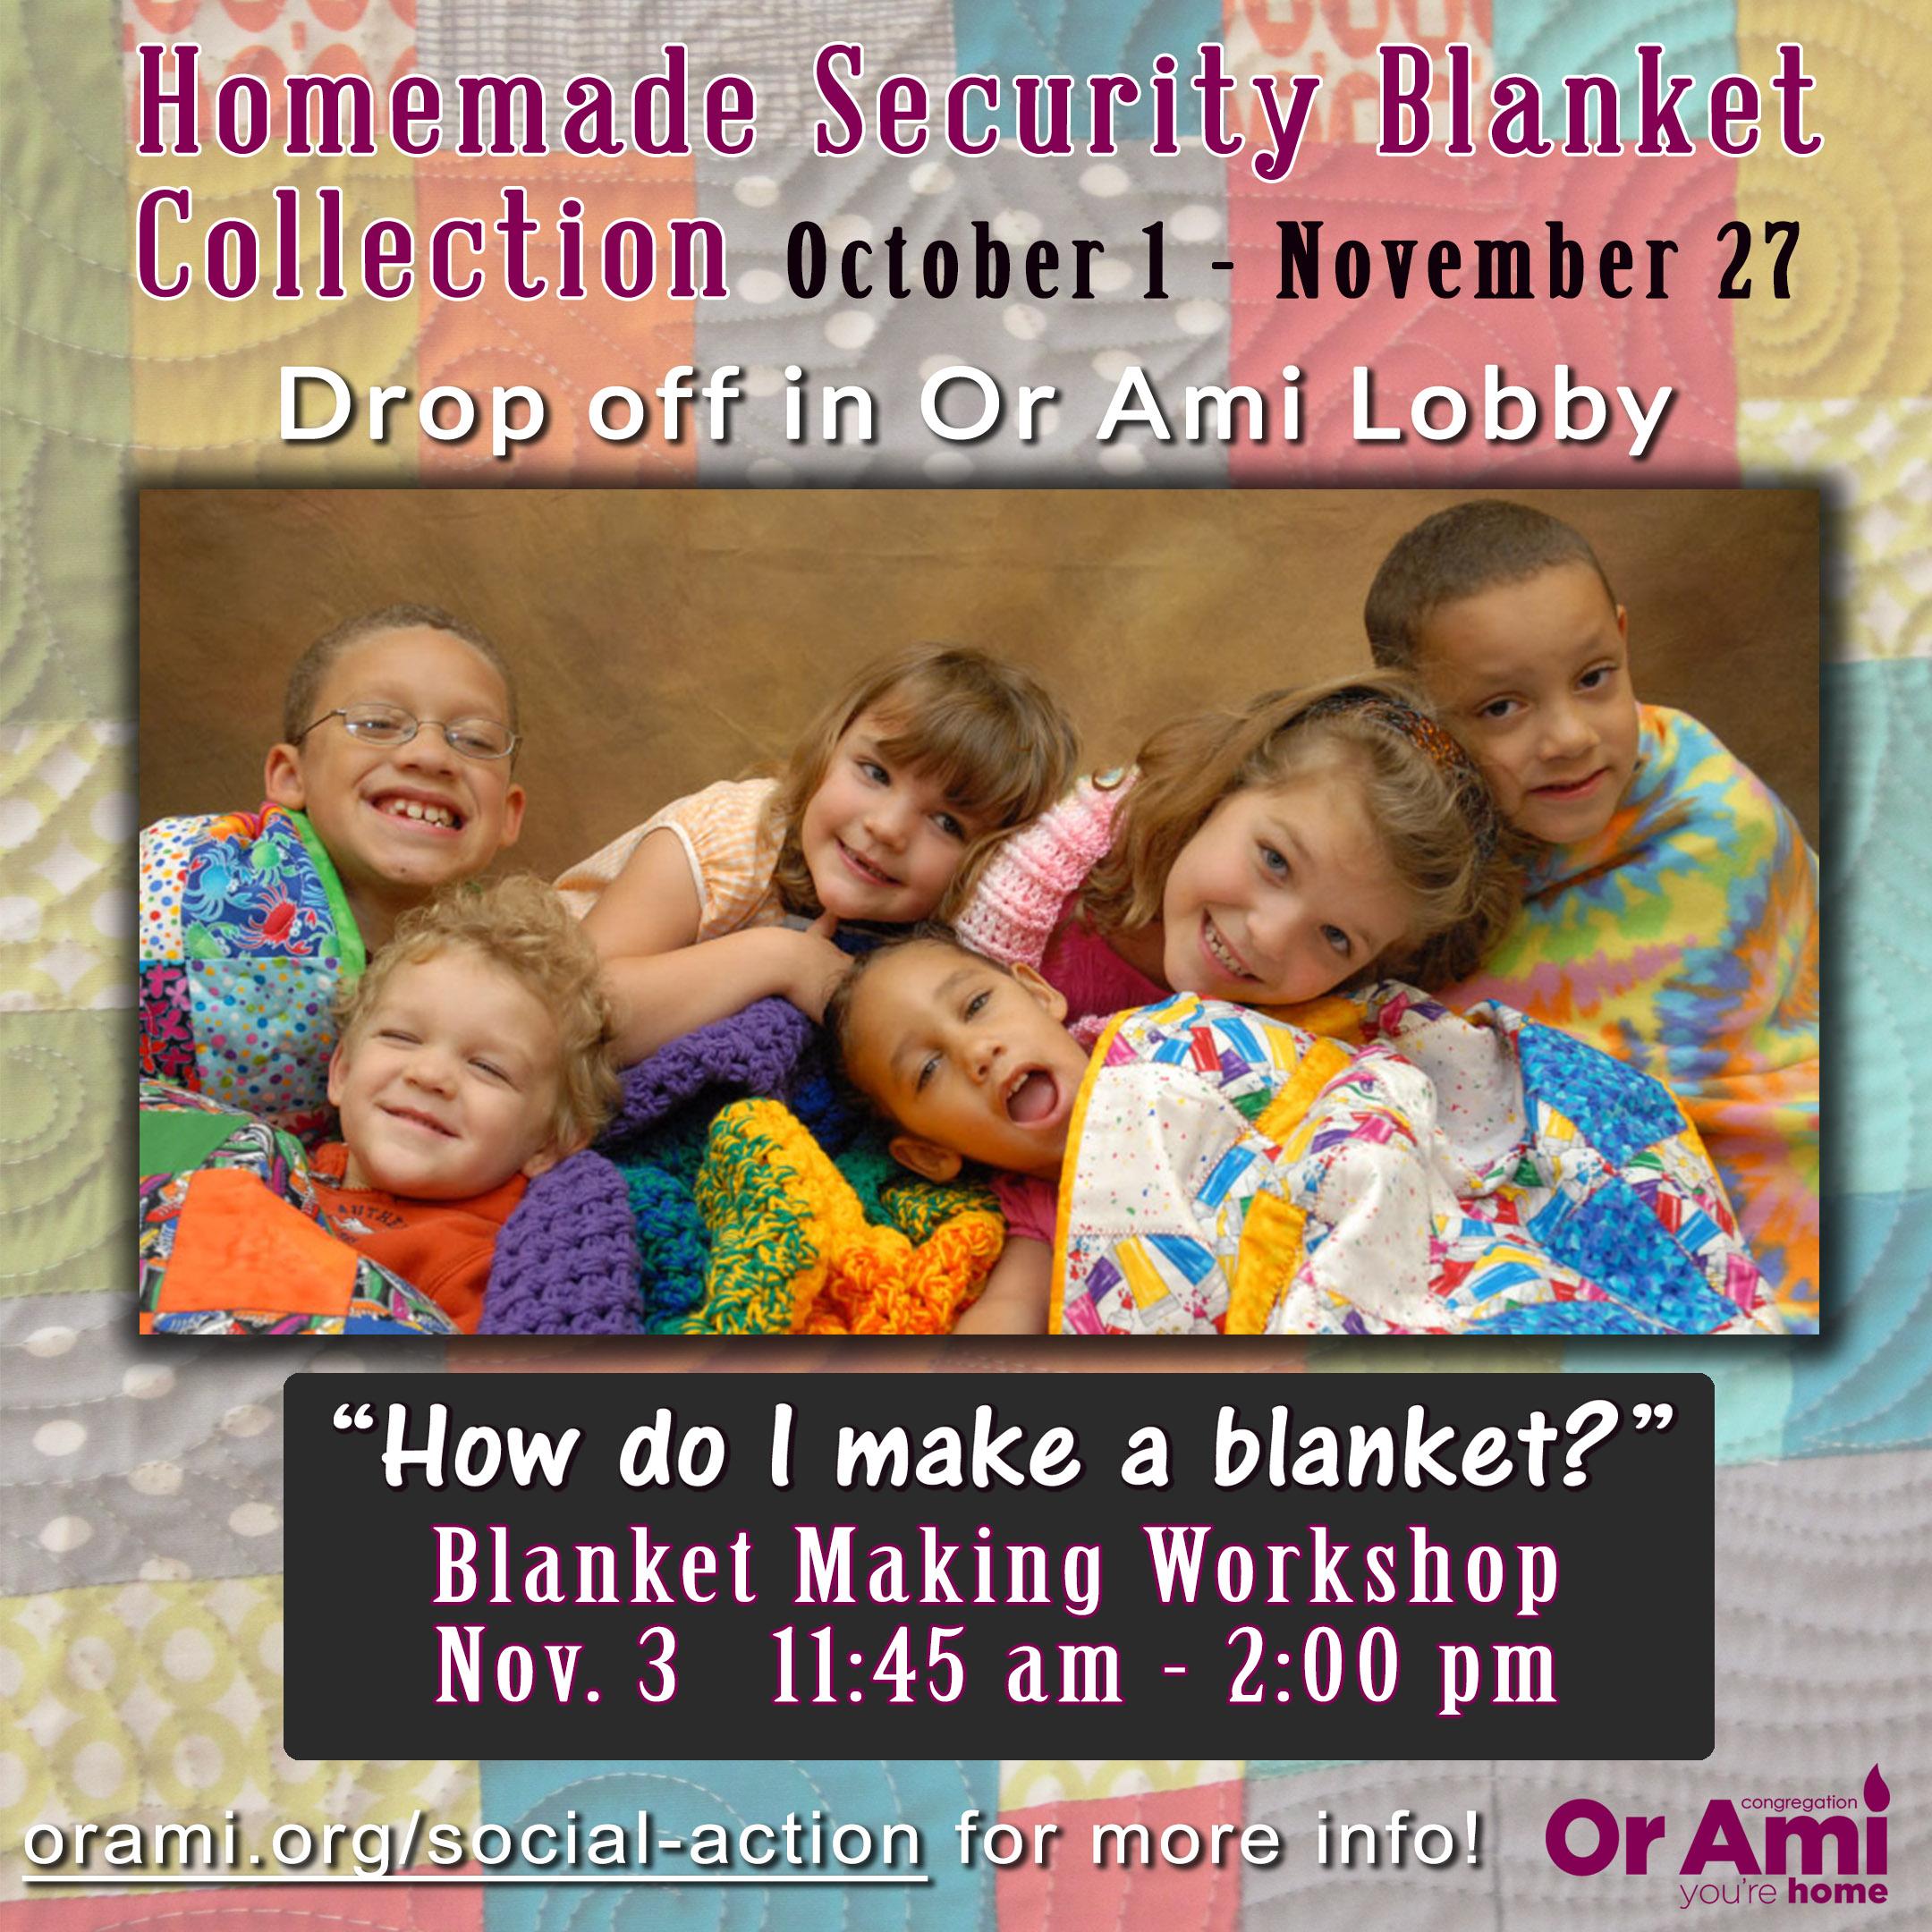 Blanket Collection with SA link